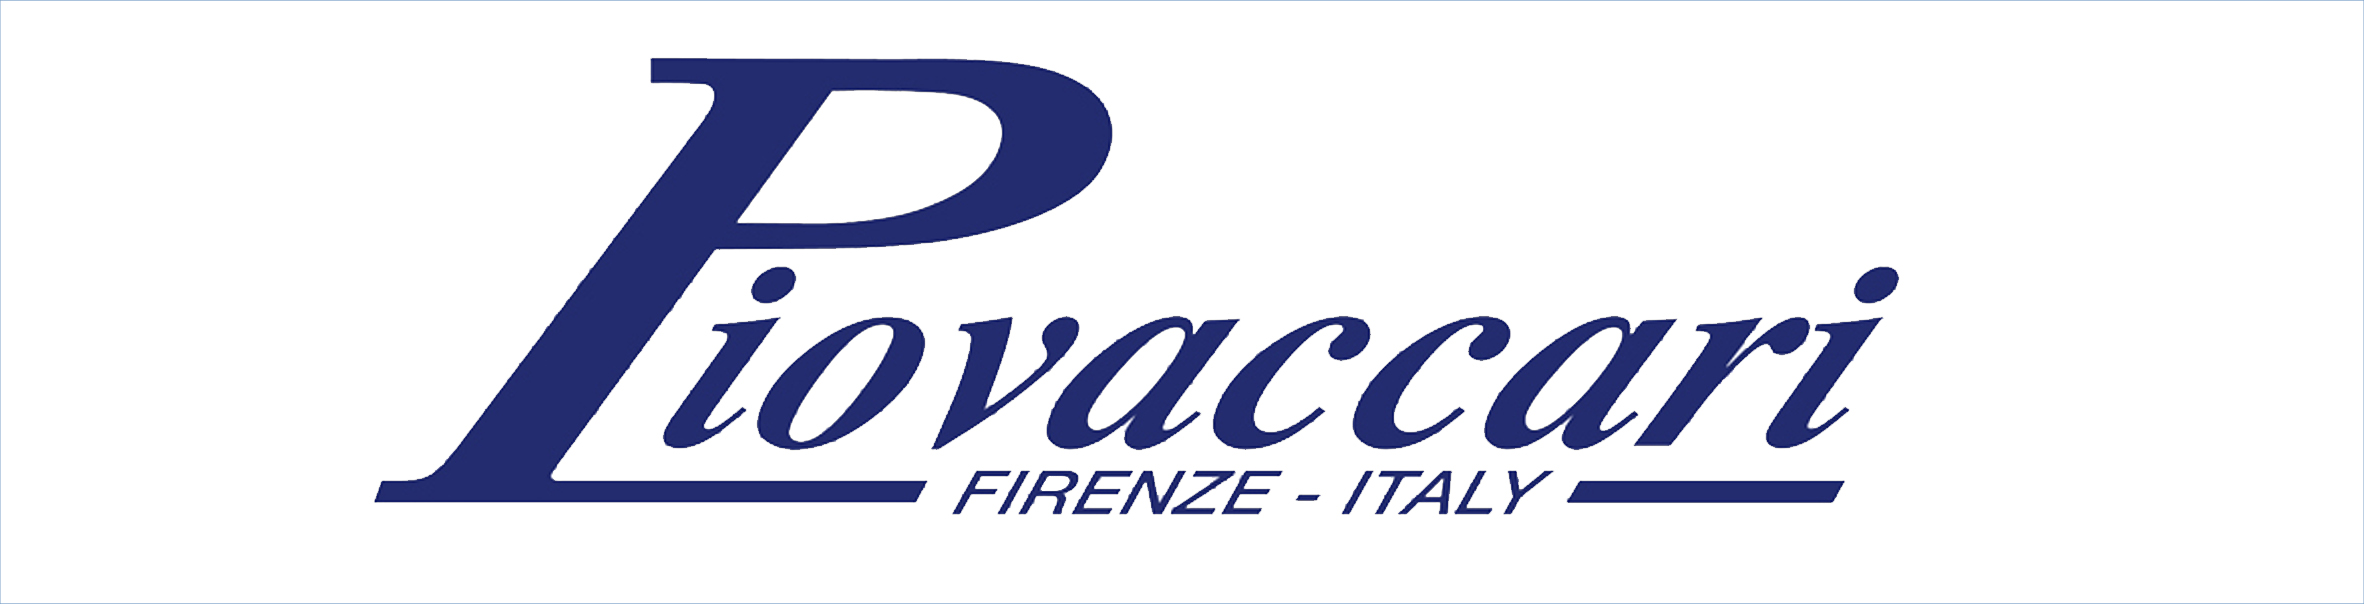 Piovaccari